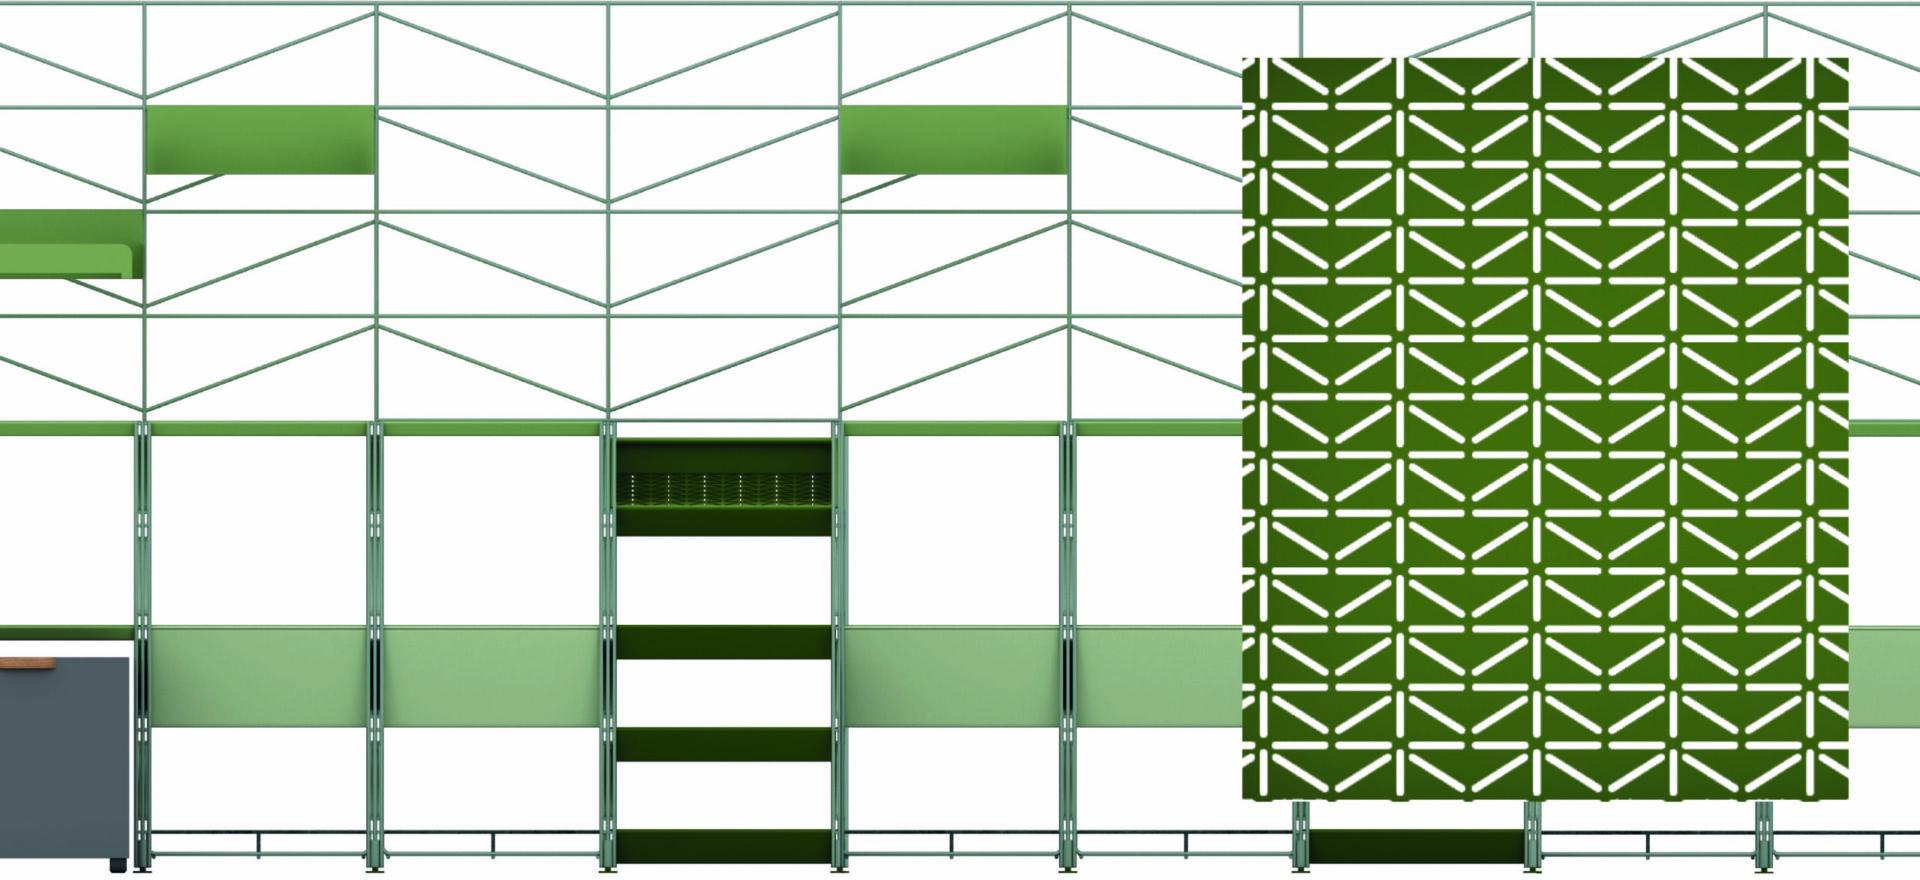 Socrate Outdoor_Outdoor Furniture_Caimi_Pattern_Mario Trimarchi Design